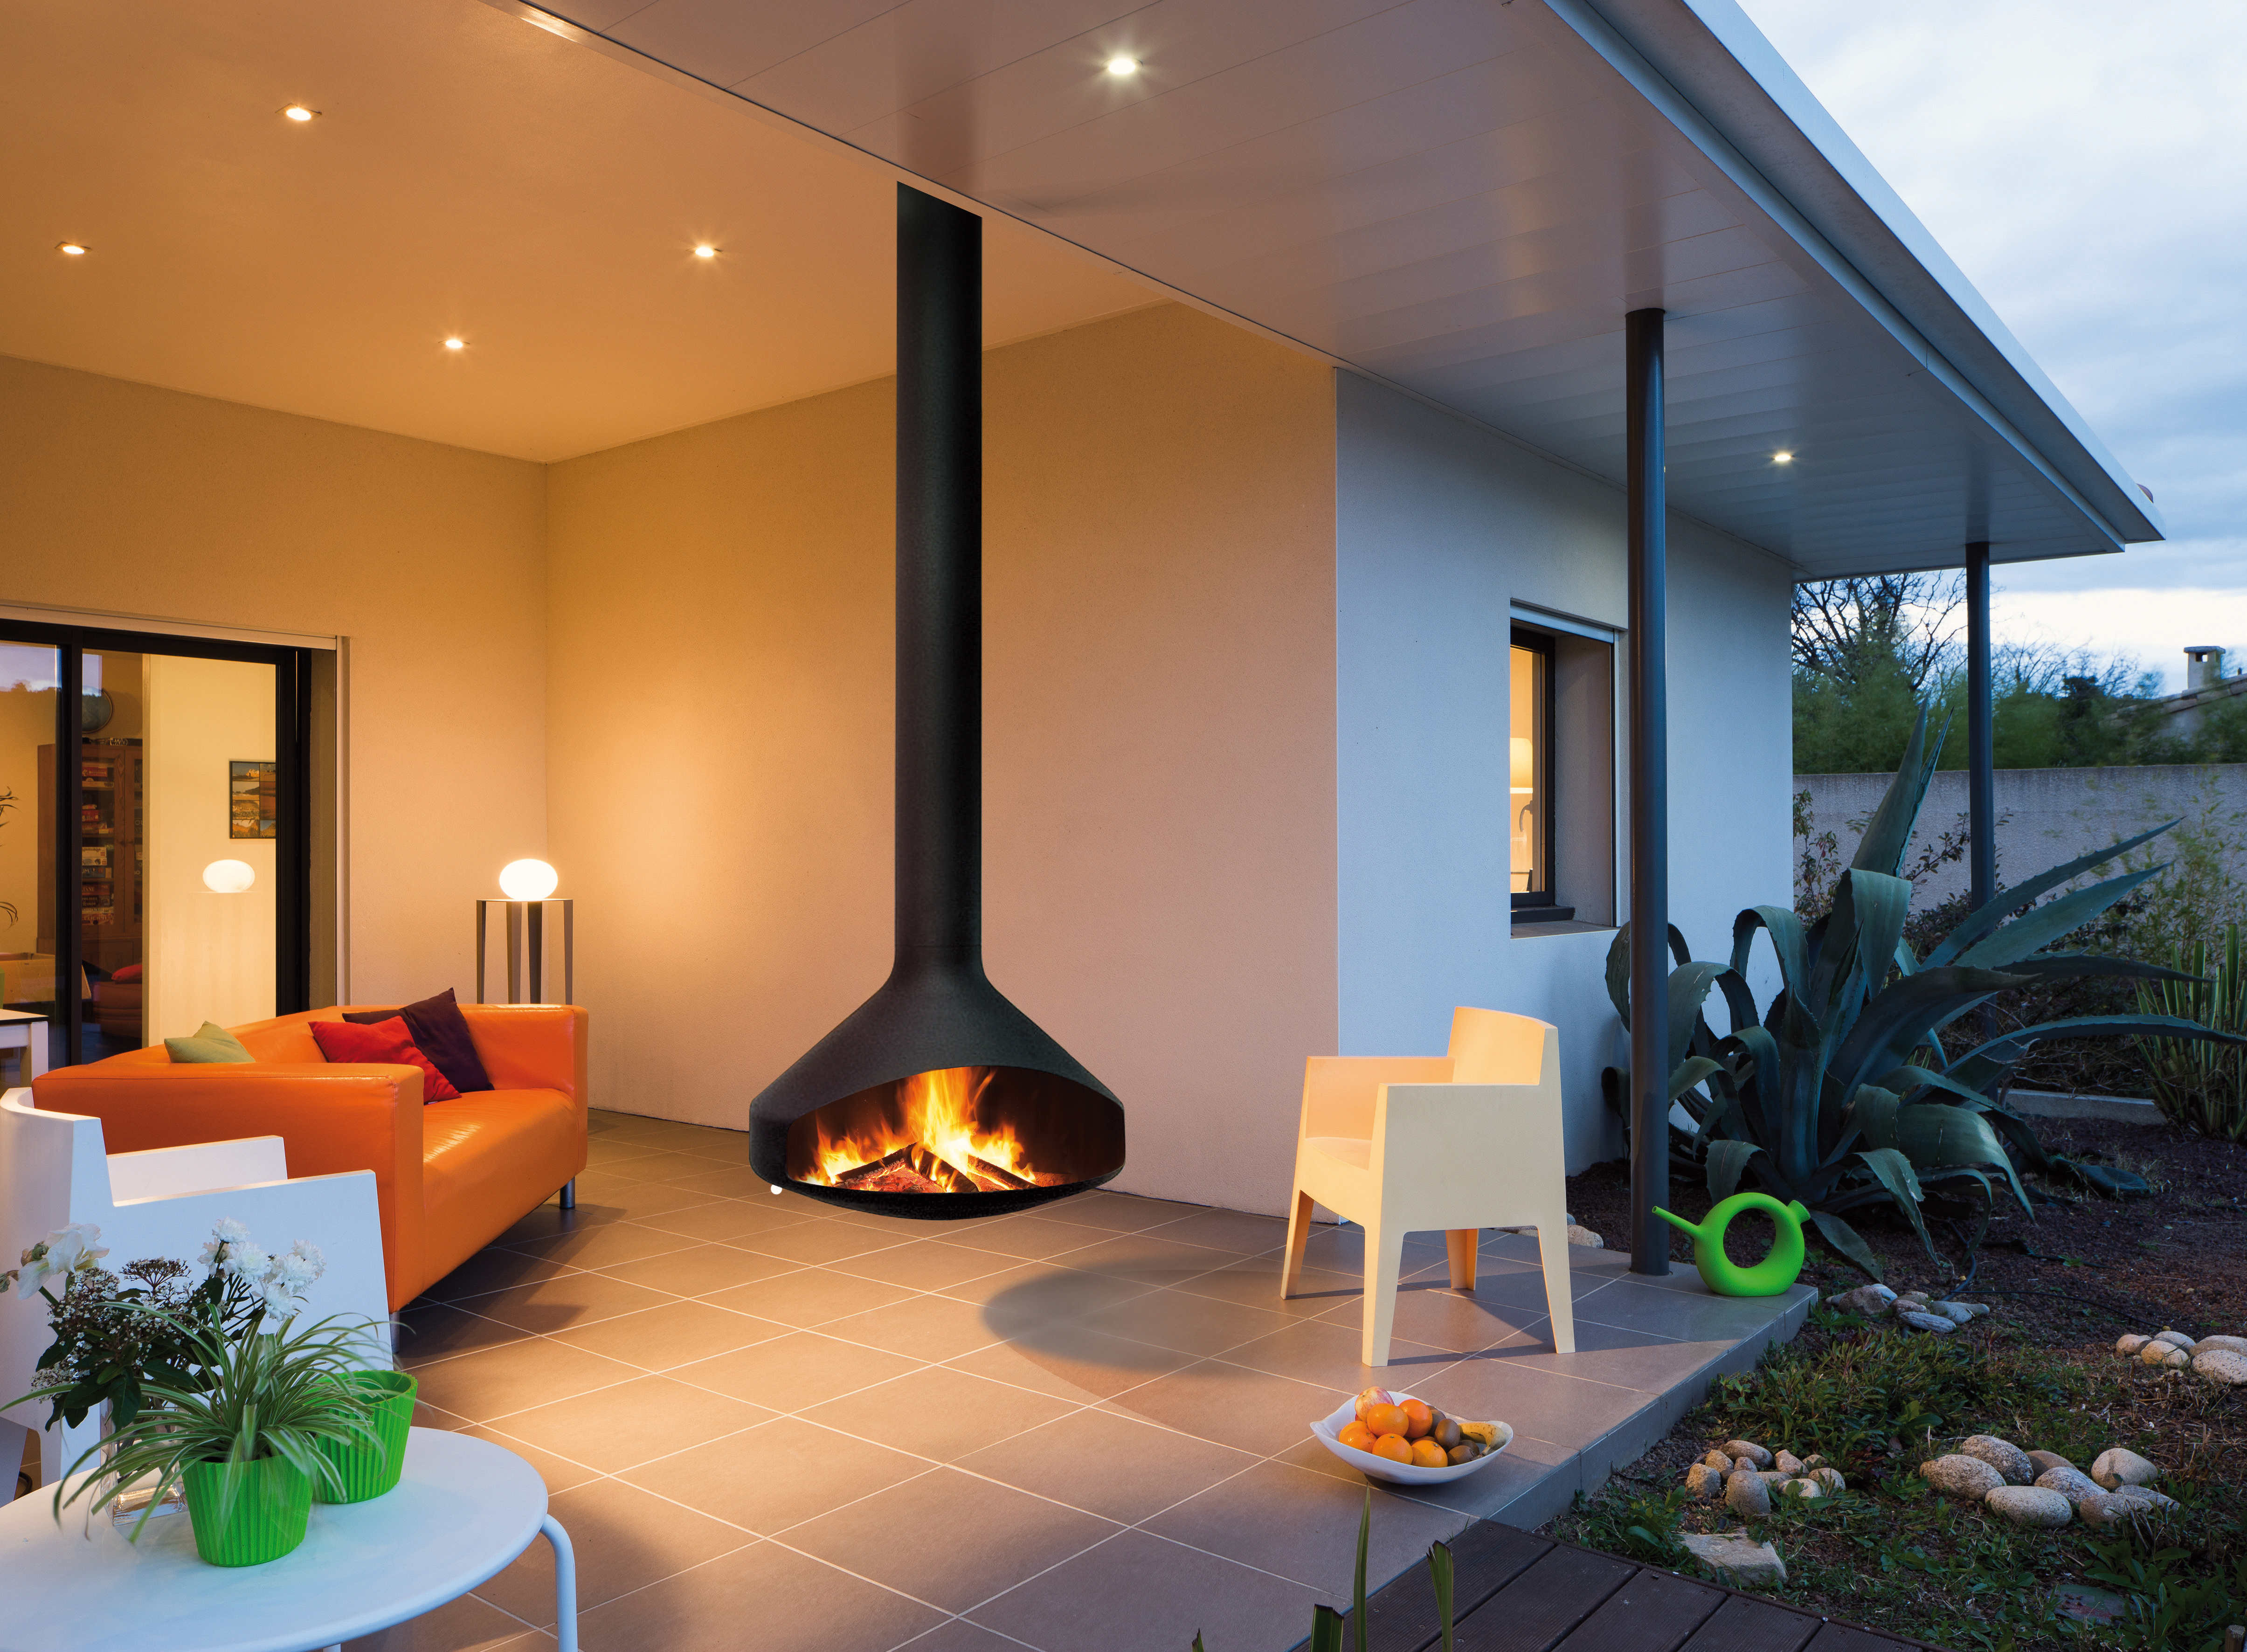 ergofocus outdoor focus. Black Bedroom Furniture Sets. Home Design Ideas